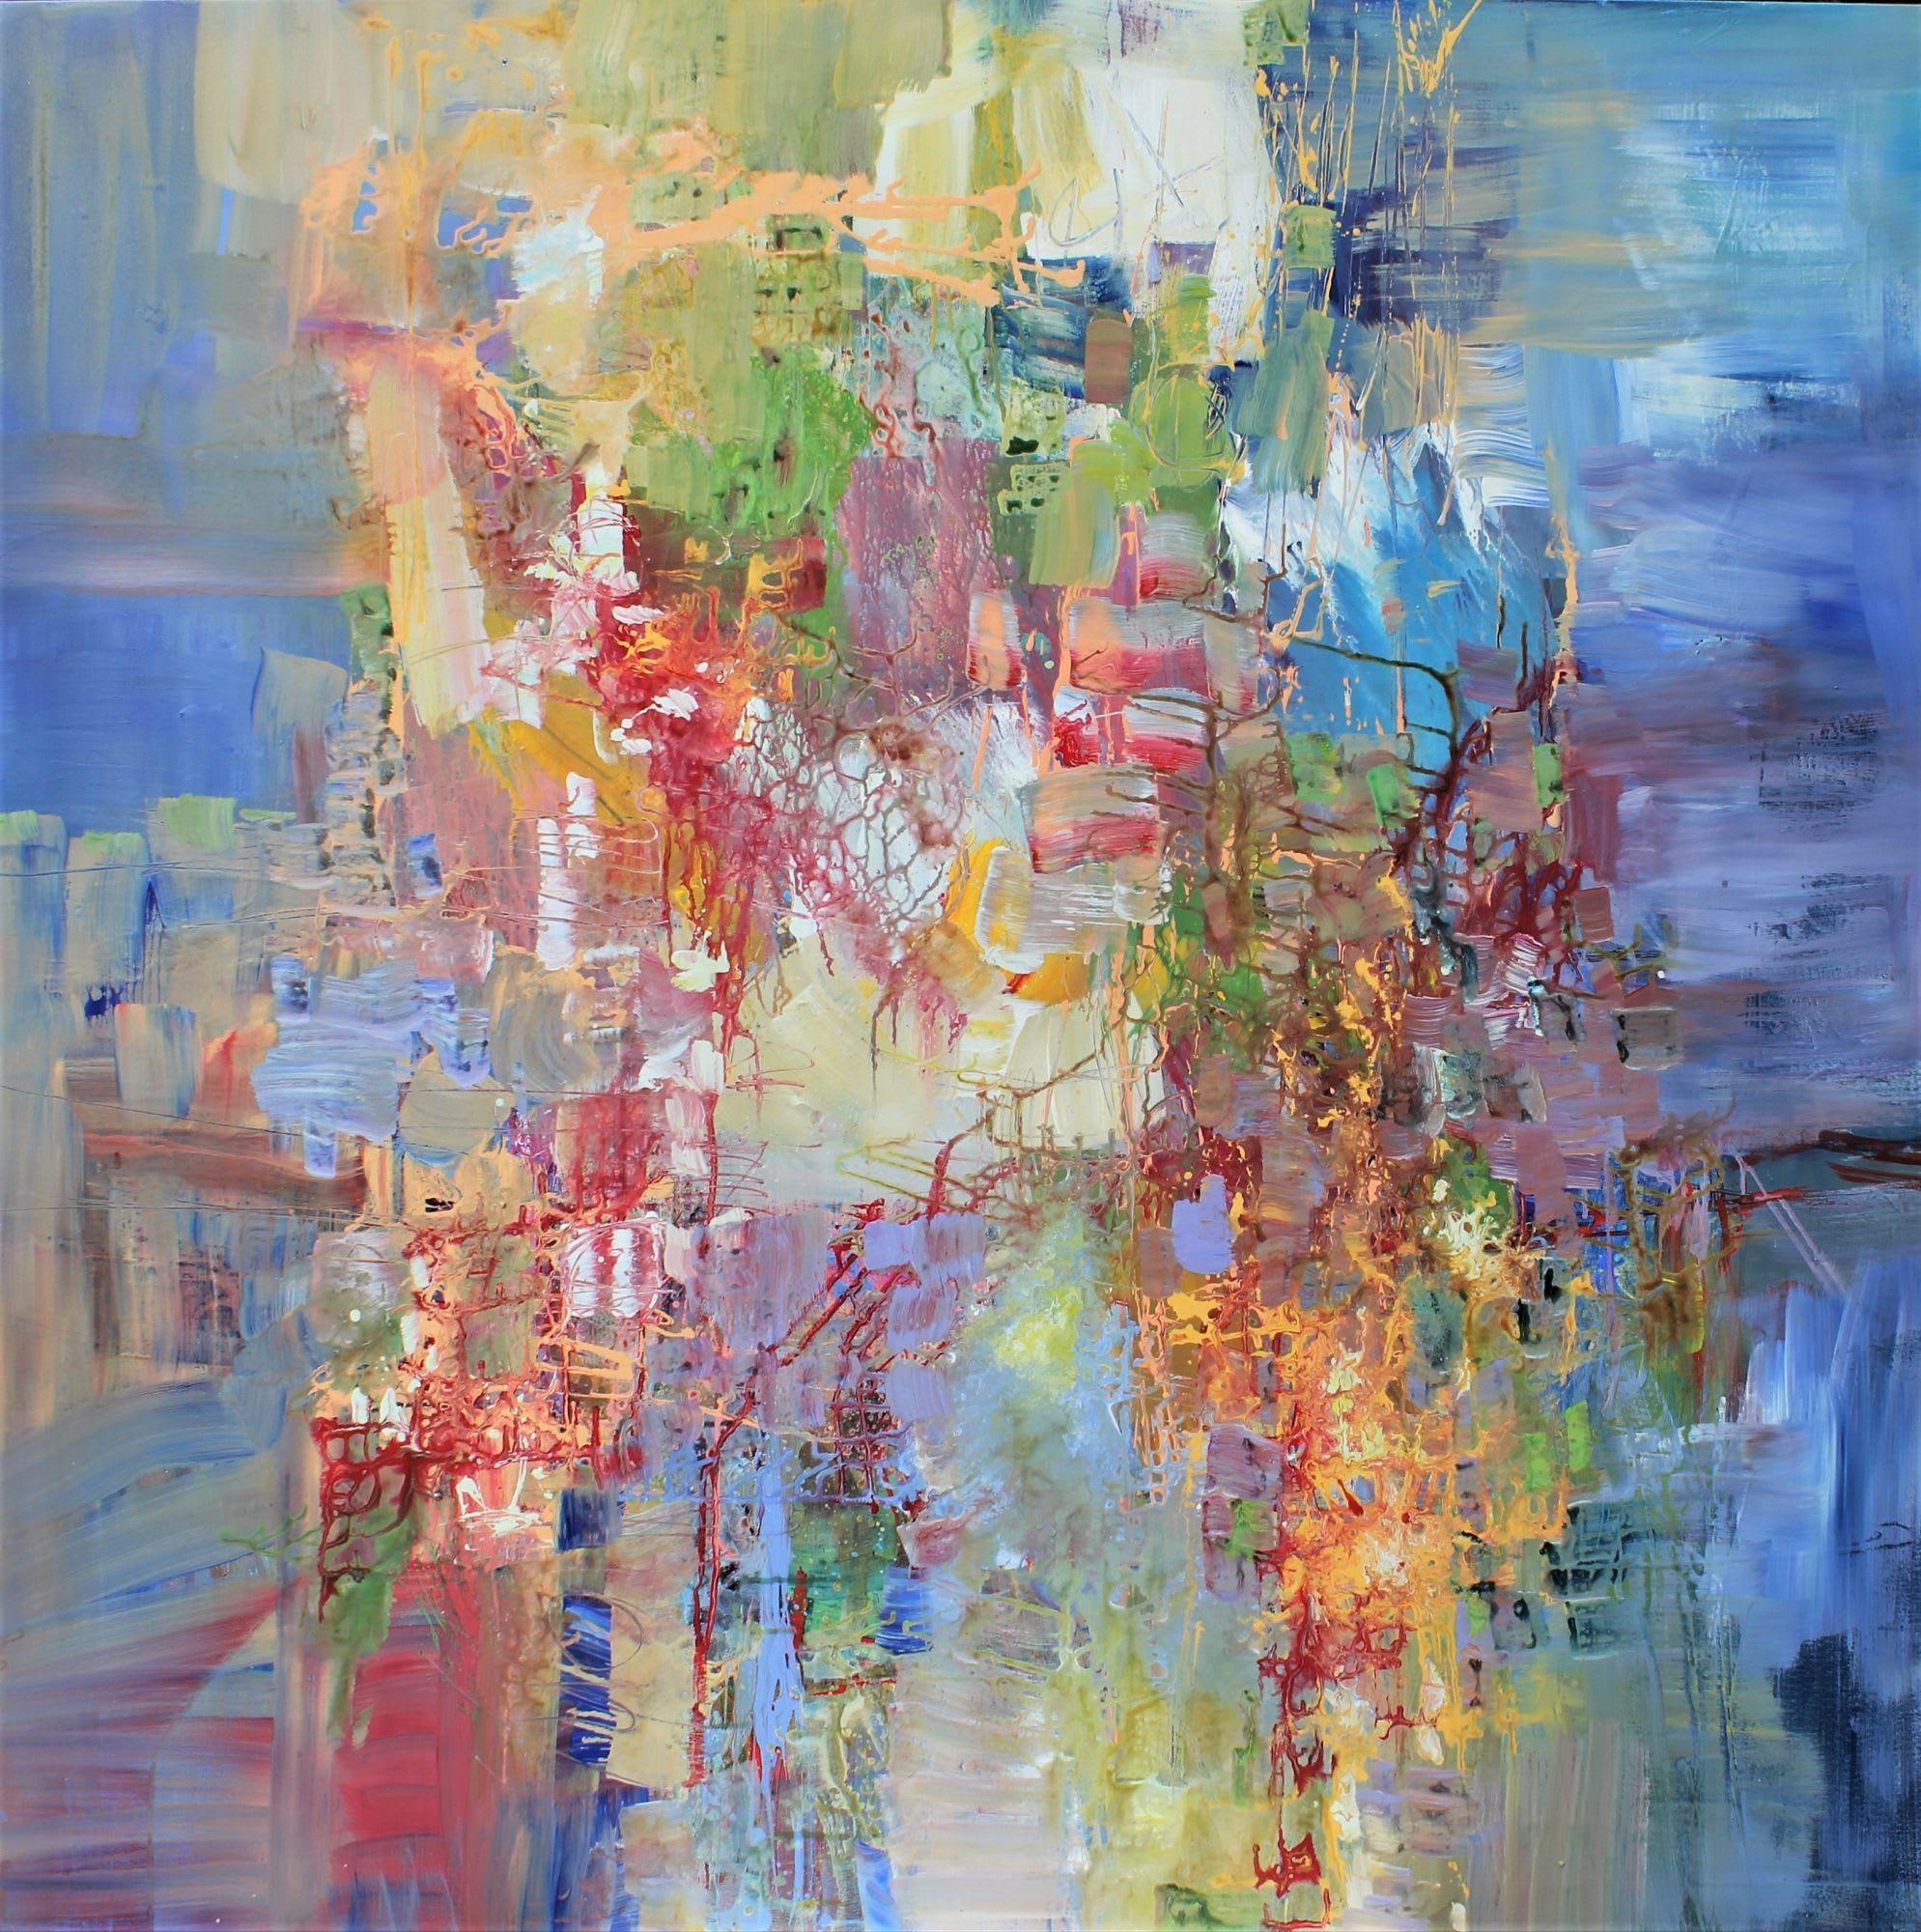 'Anton Bruckner Festkantate' by Ernestine Tahedl at Gallery 133